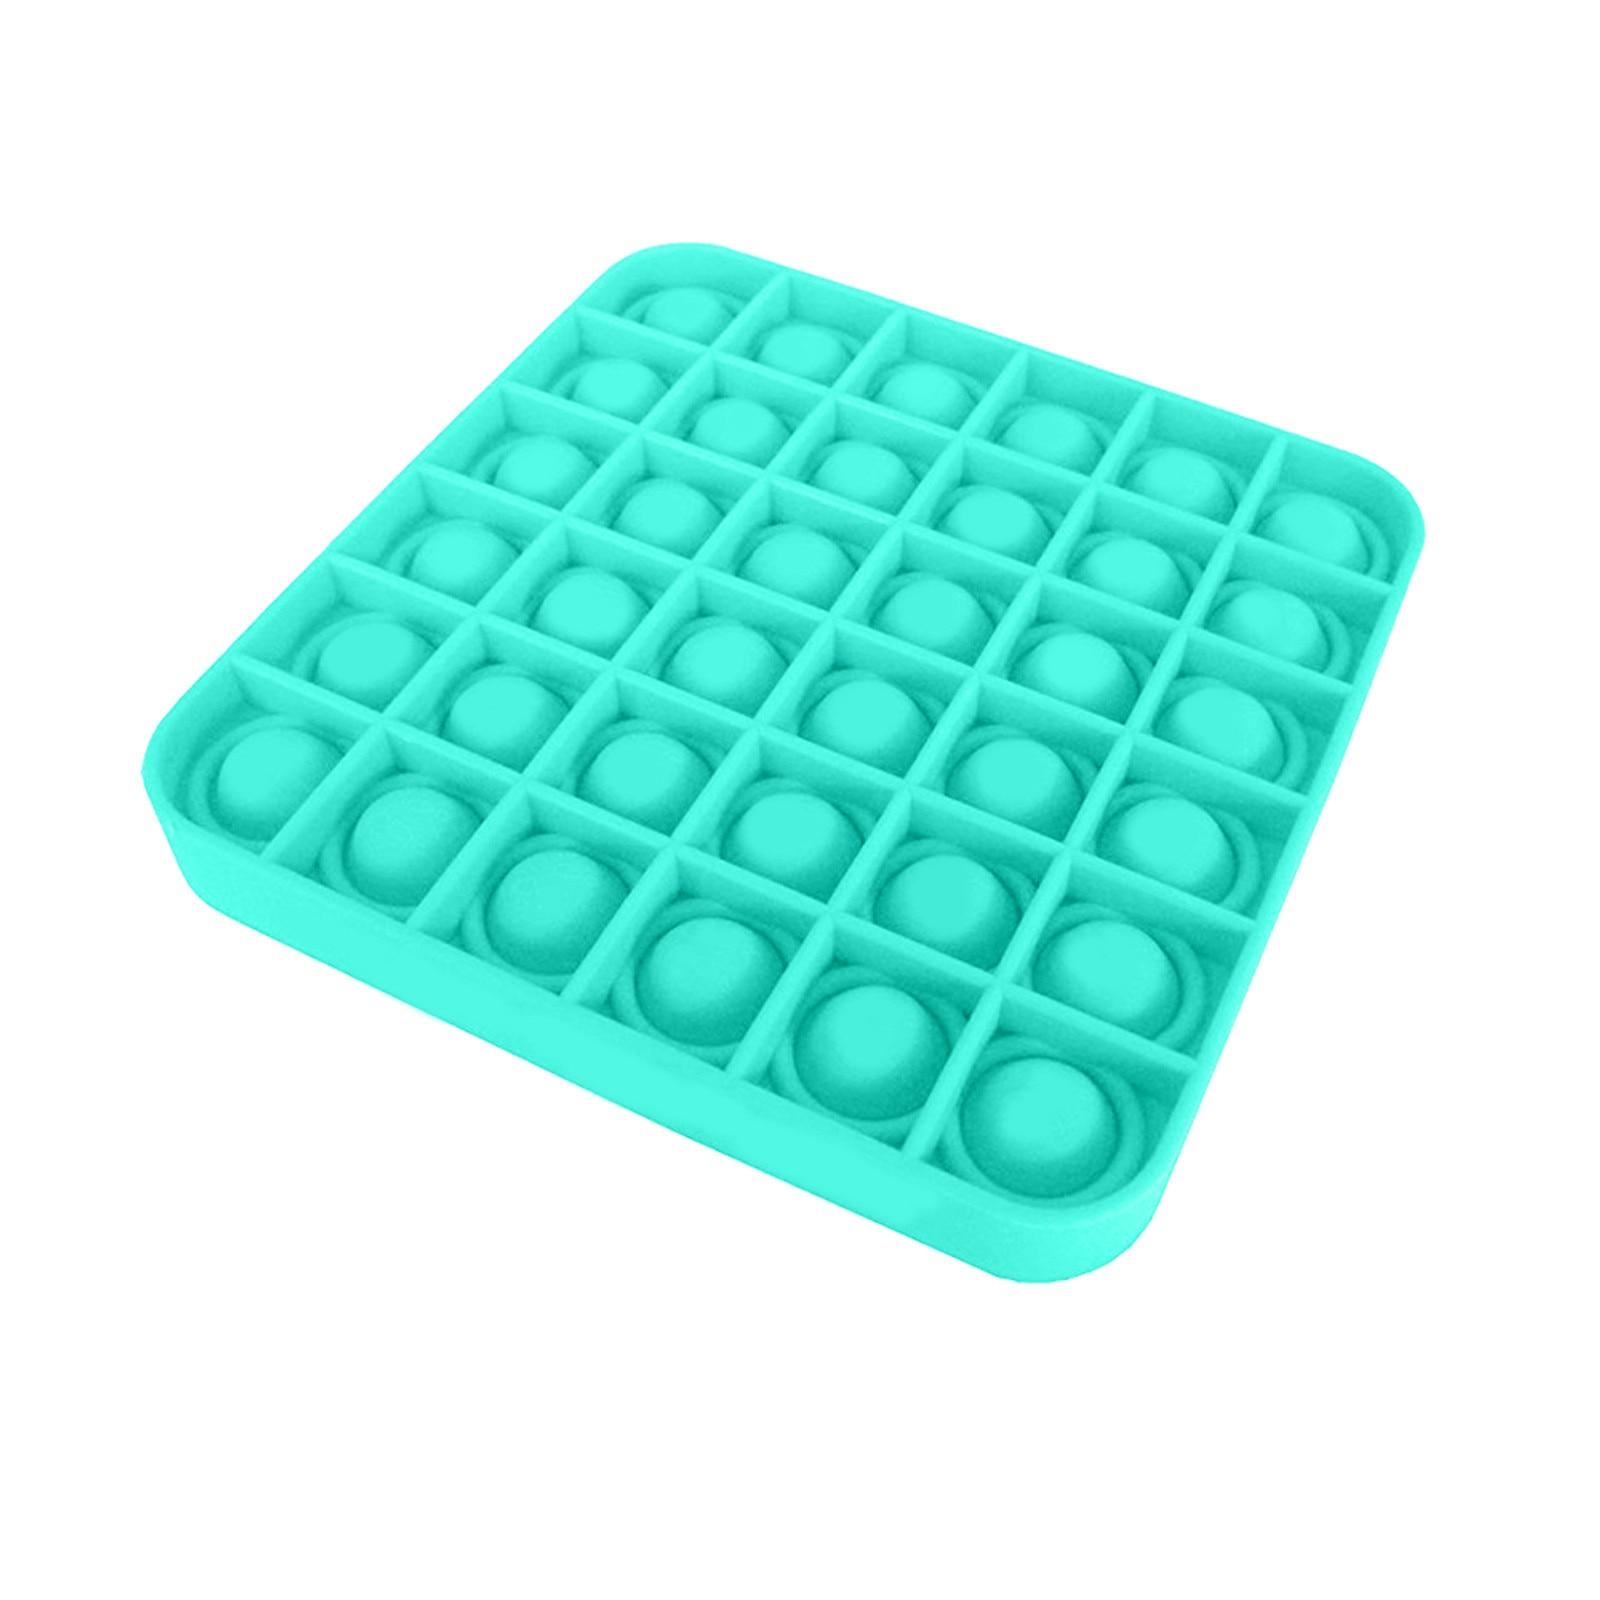 Toys Adult Autism Pops-It-Fidget Funny Squishy Bubble-Sensory-Toy Reliver-Stress Needs